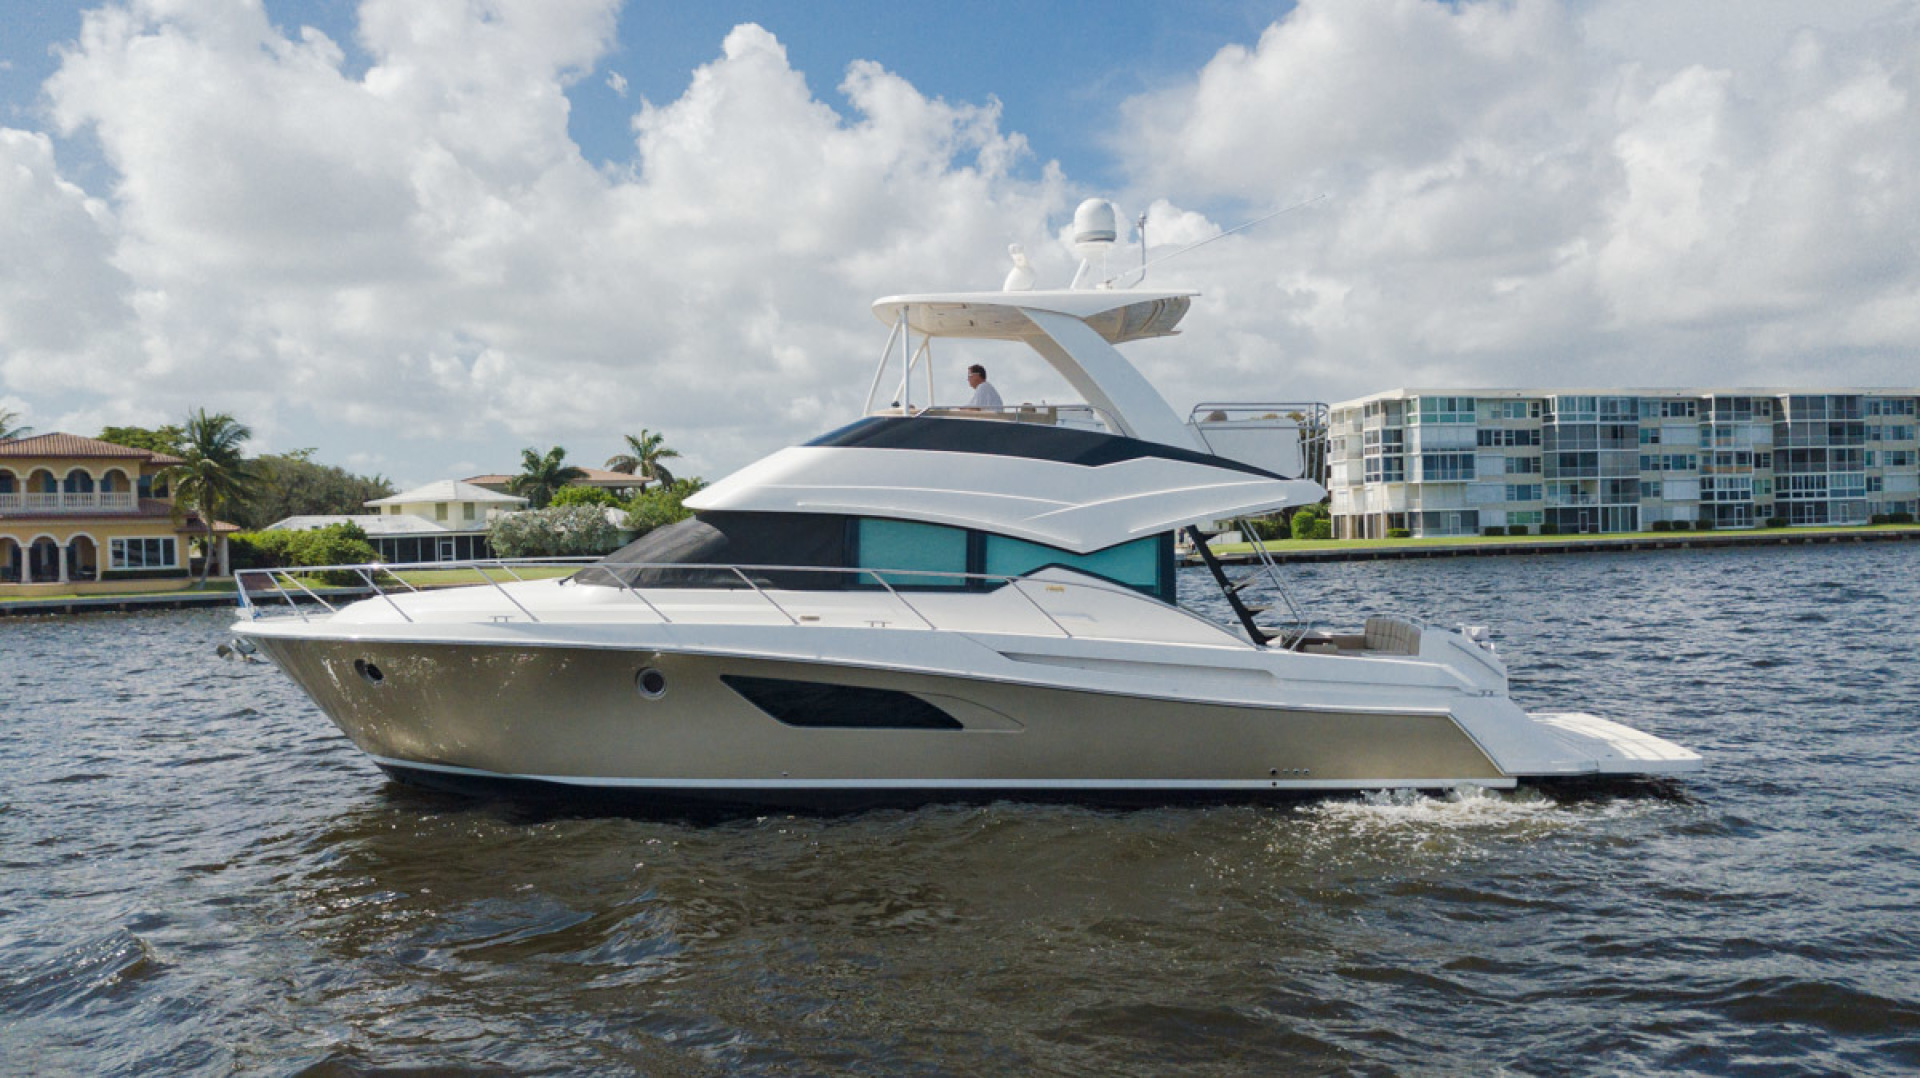 Tiara Yachts-50 Flybridge 2015-Khatch You Later North Palm Beach-Florida-United States-Khatch You Later-1509534 | Thumbnail